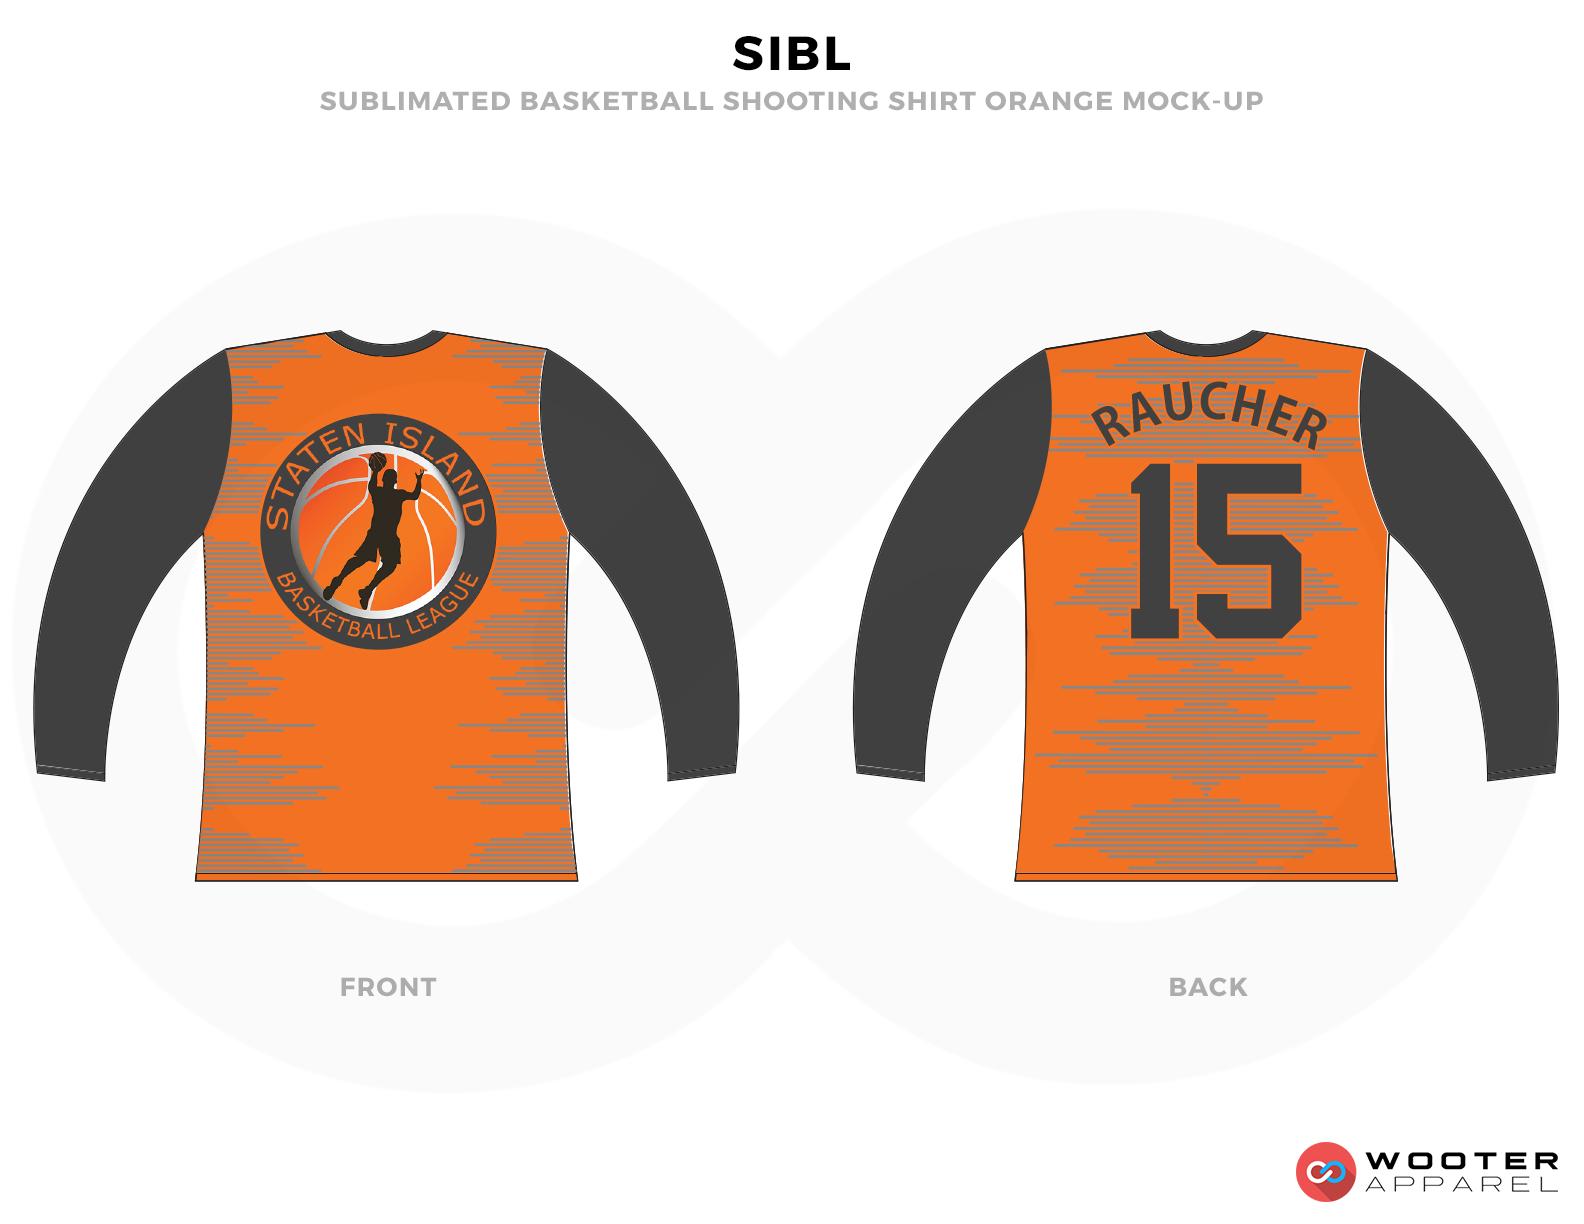 SIBL Orange and Black Basketball Uniforms, Jersey